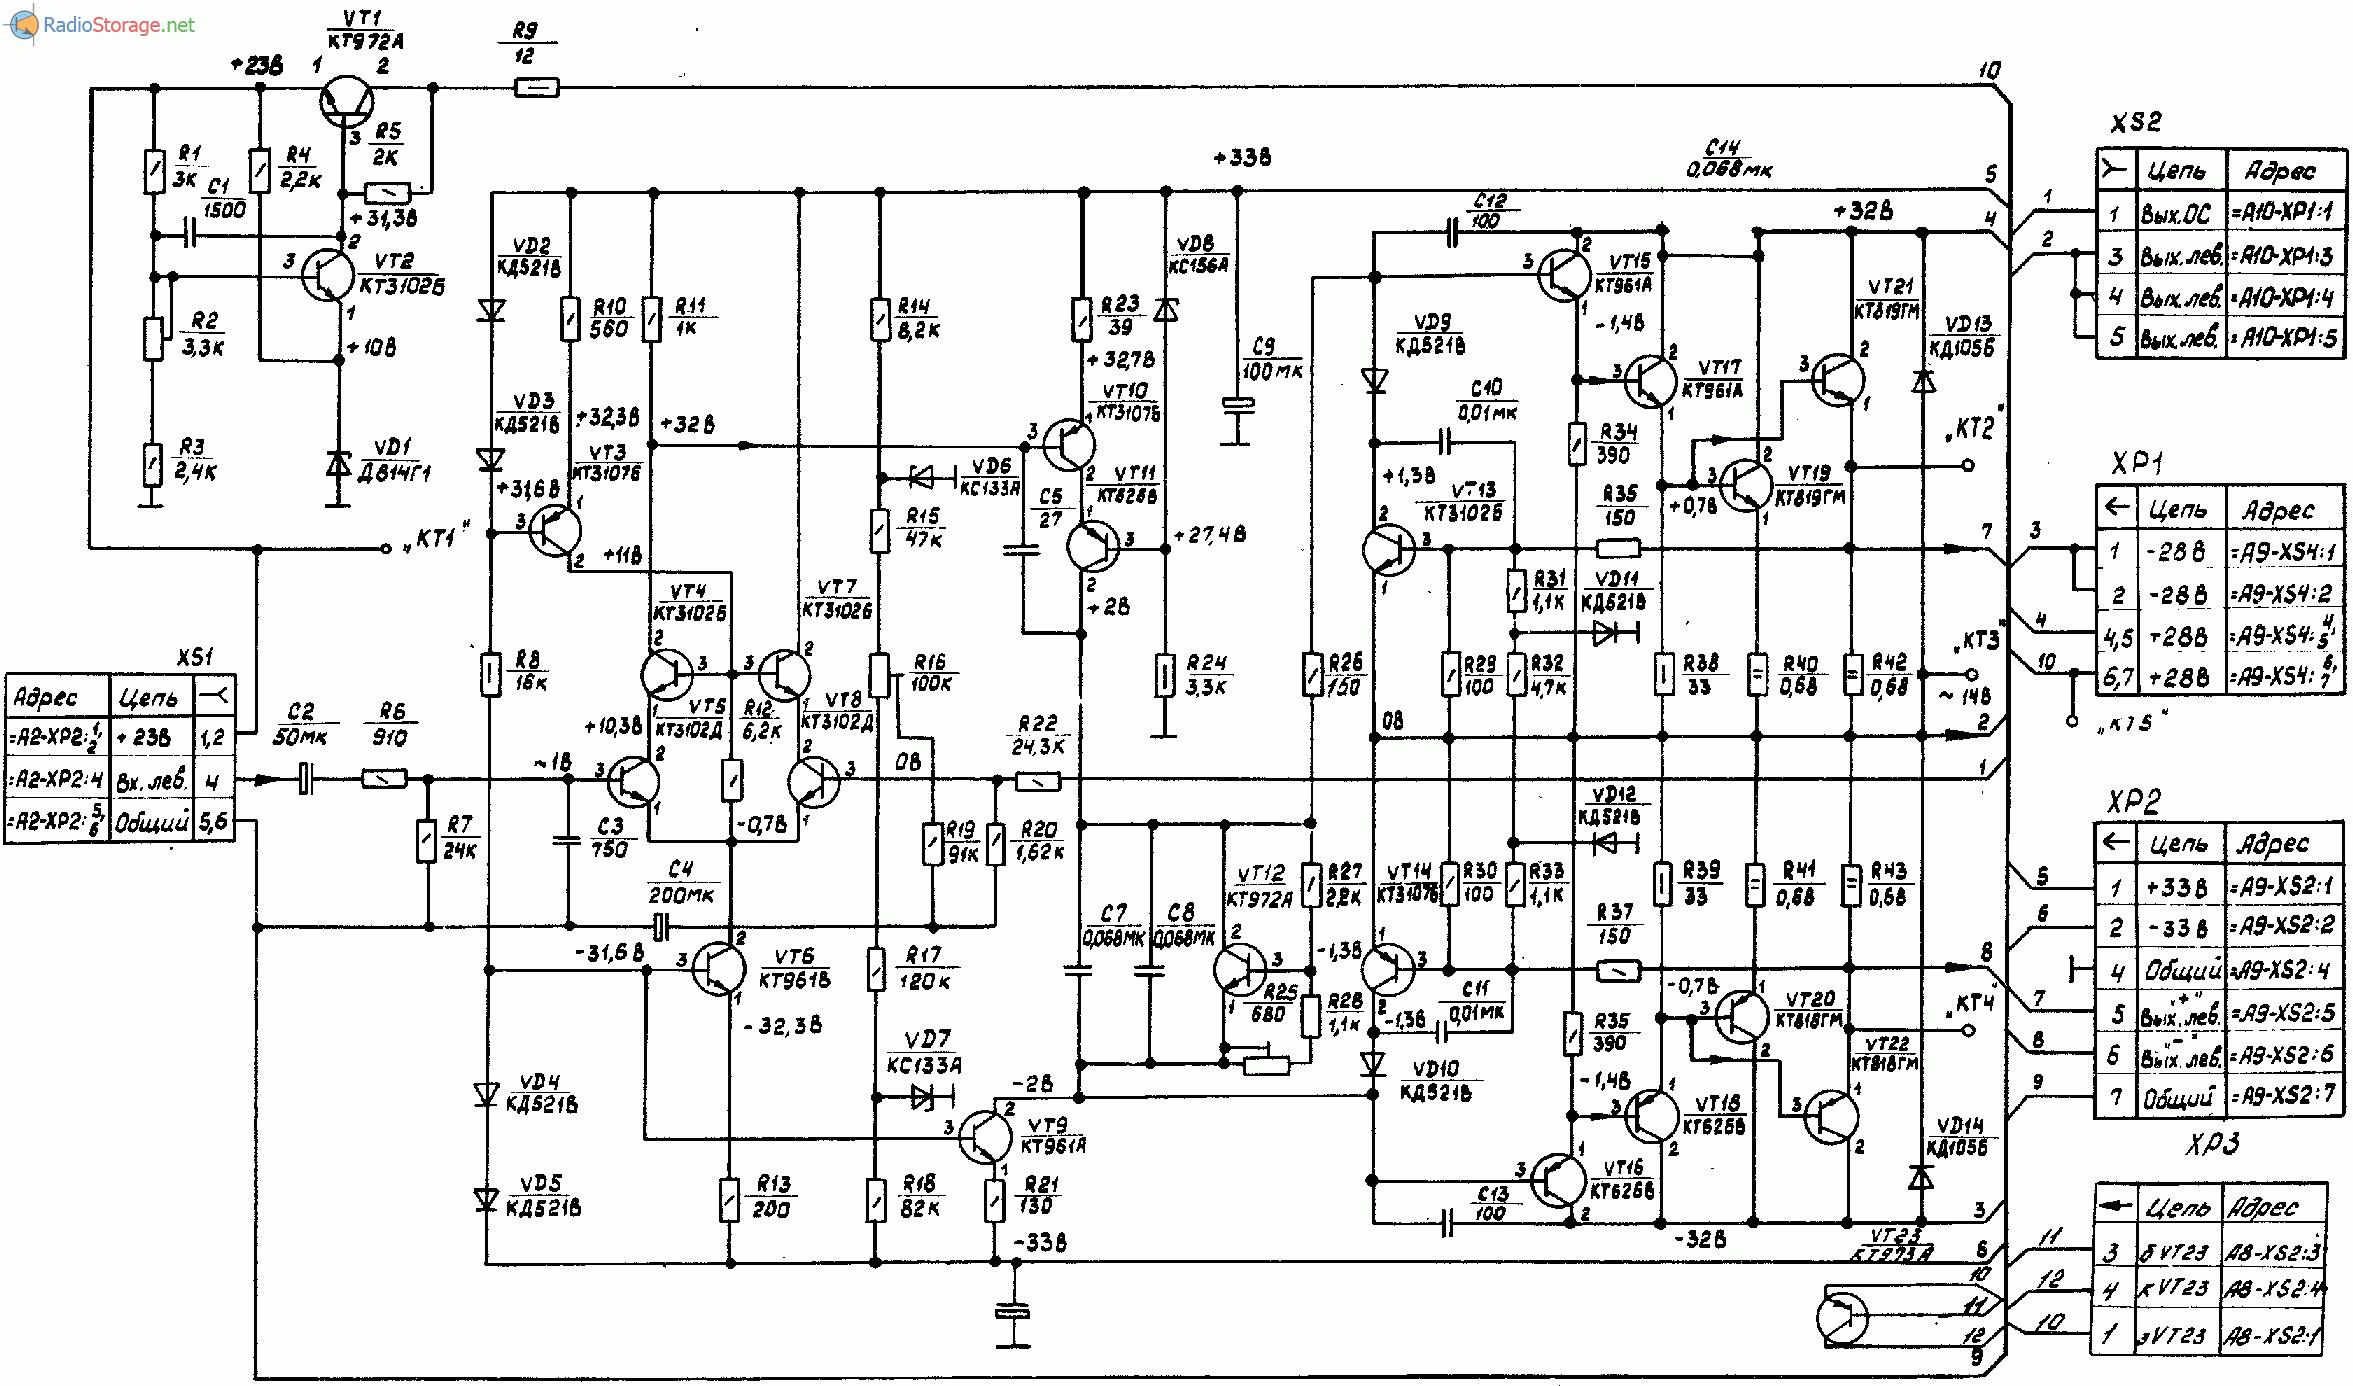 схема мелодия 106 стерео